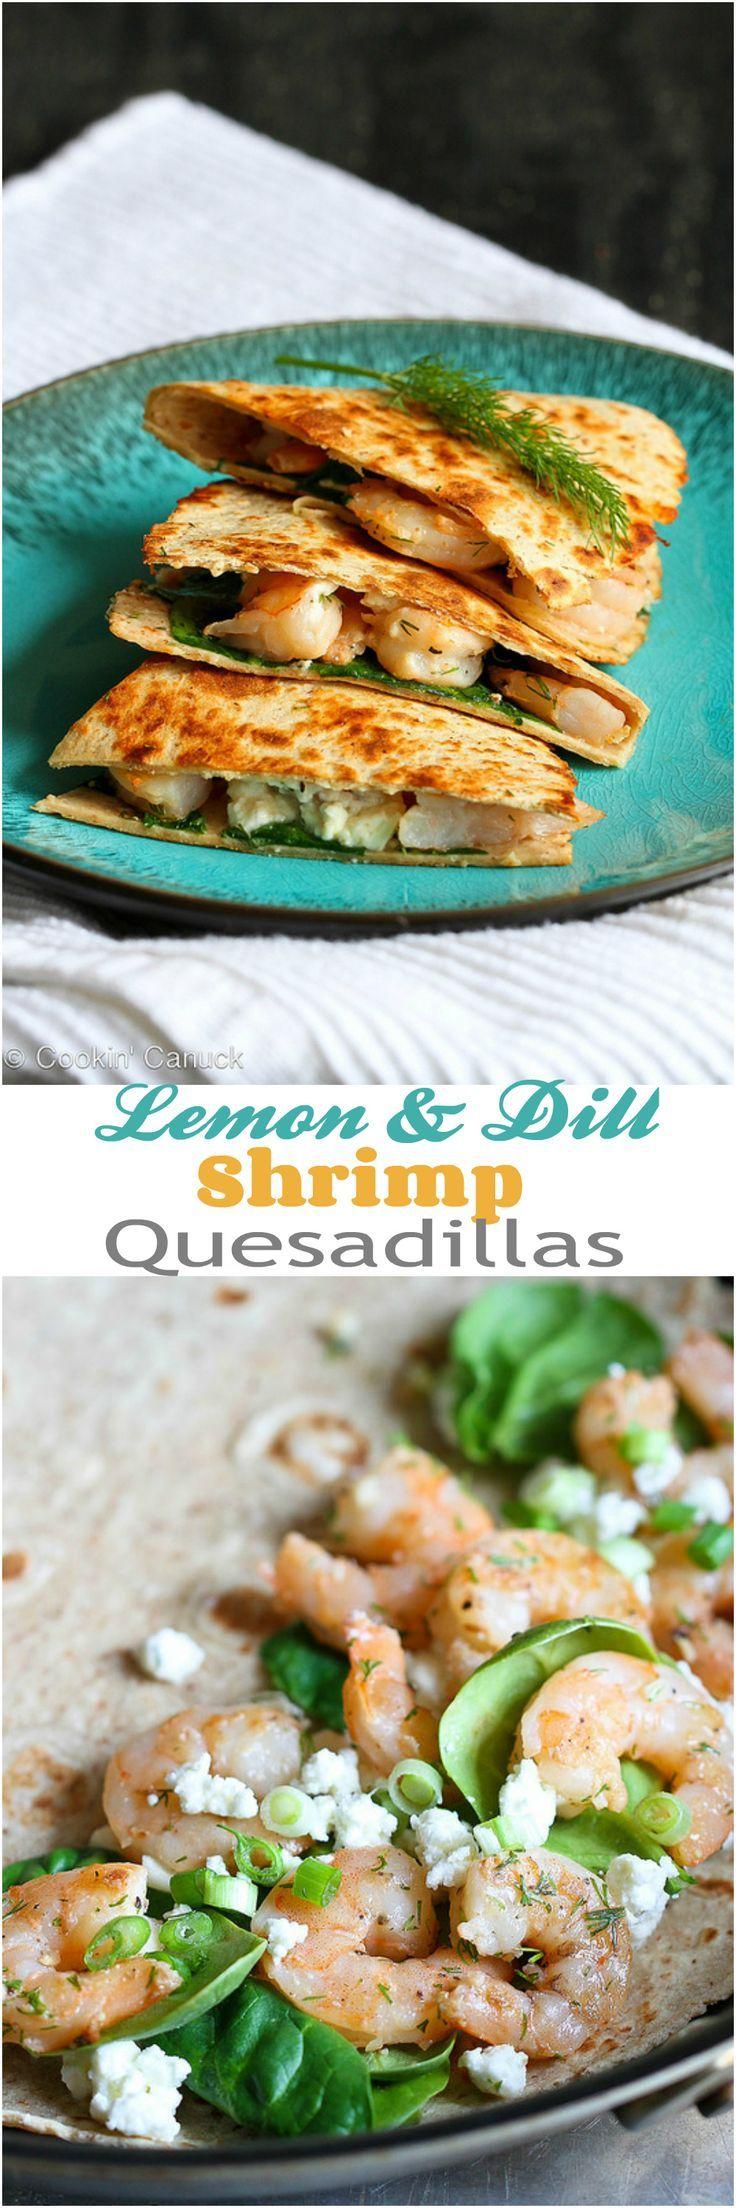 Lemon Dill Shrimp Quesadilla Recipe...257 calories and 6 Weight Watchers PP   cookincanuck.com #healthy